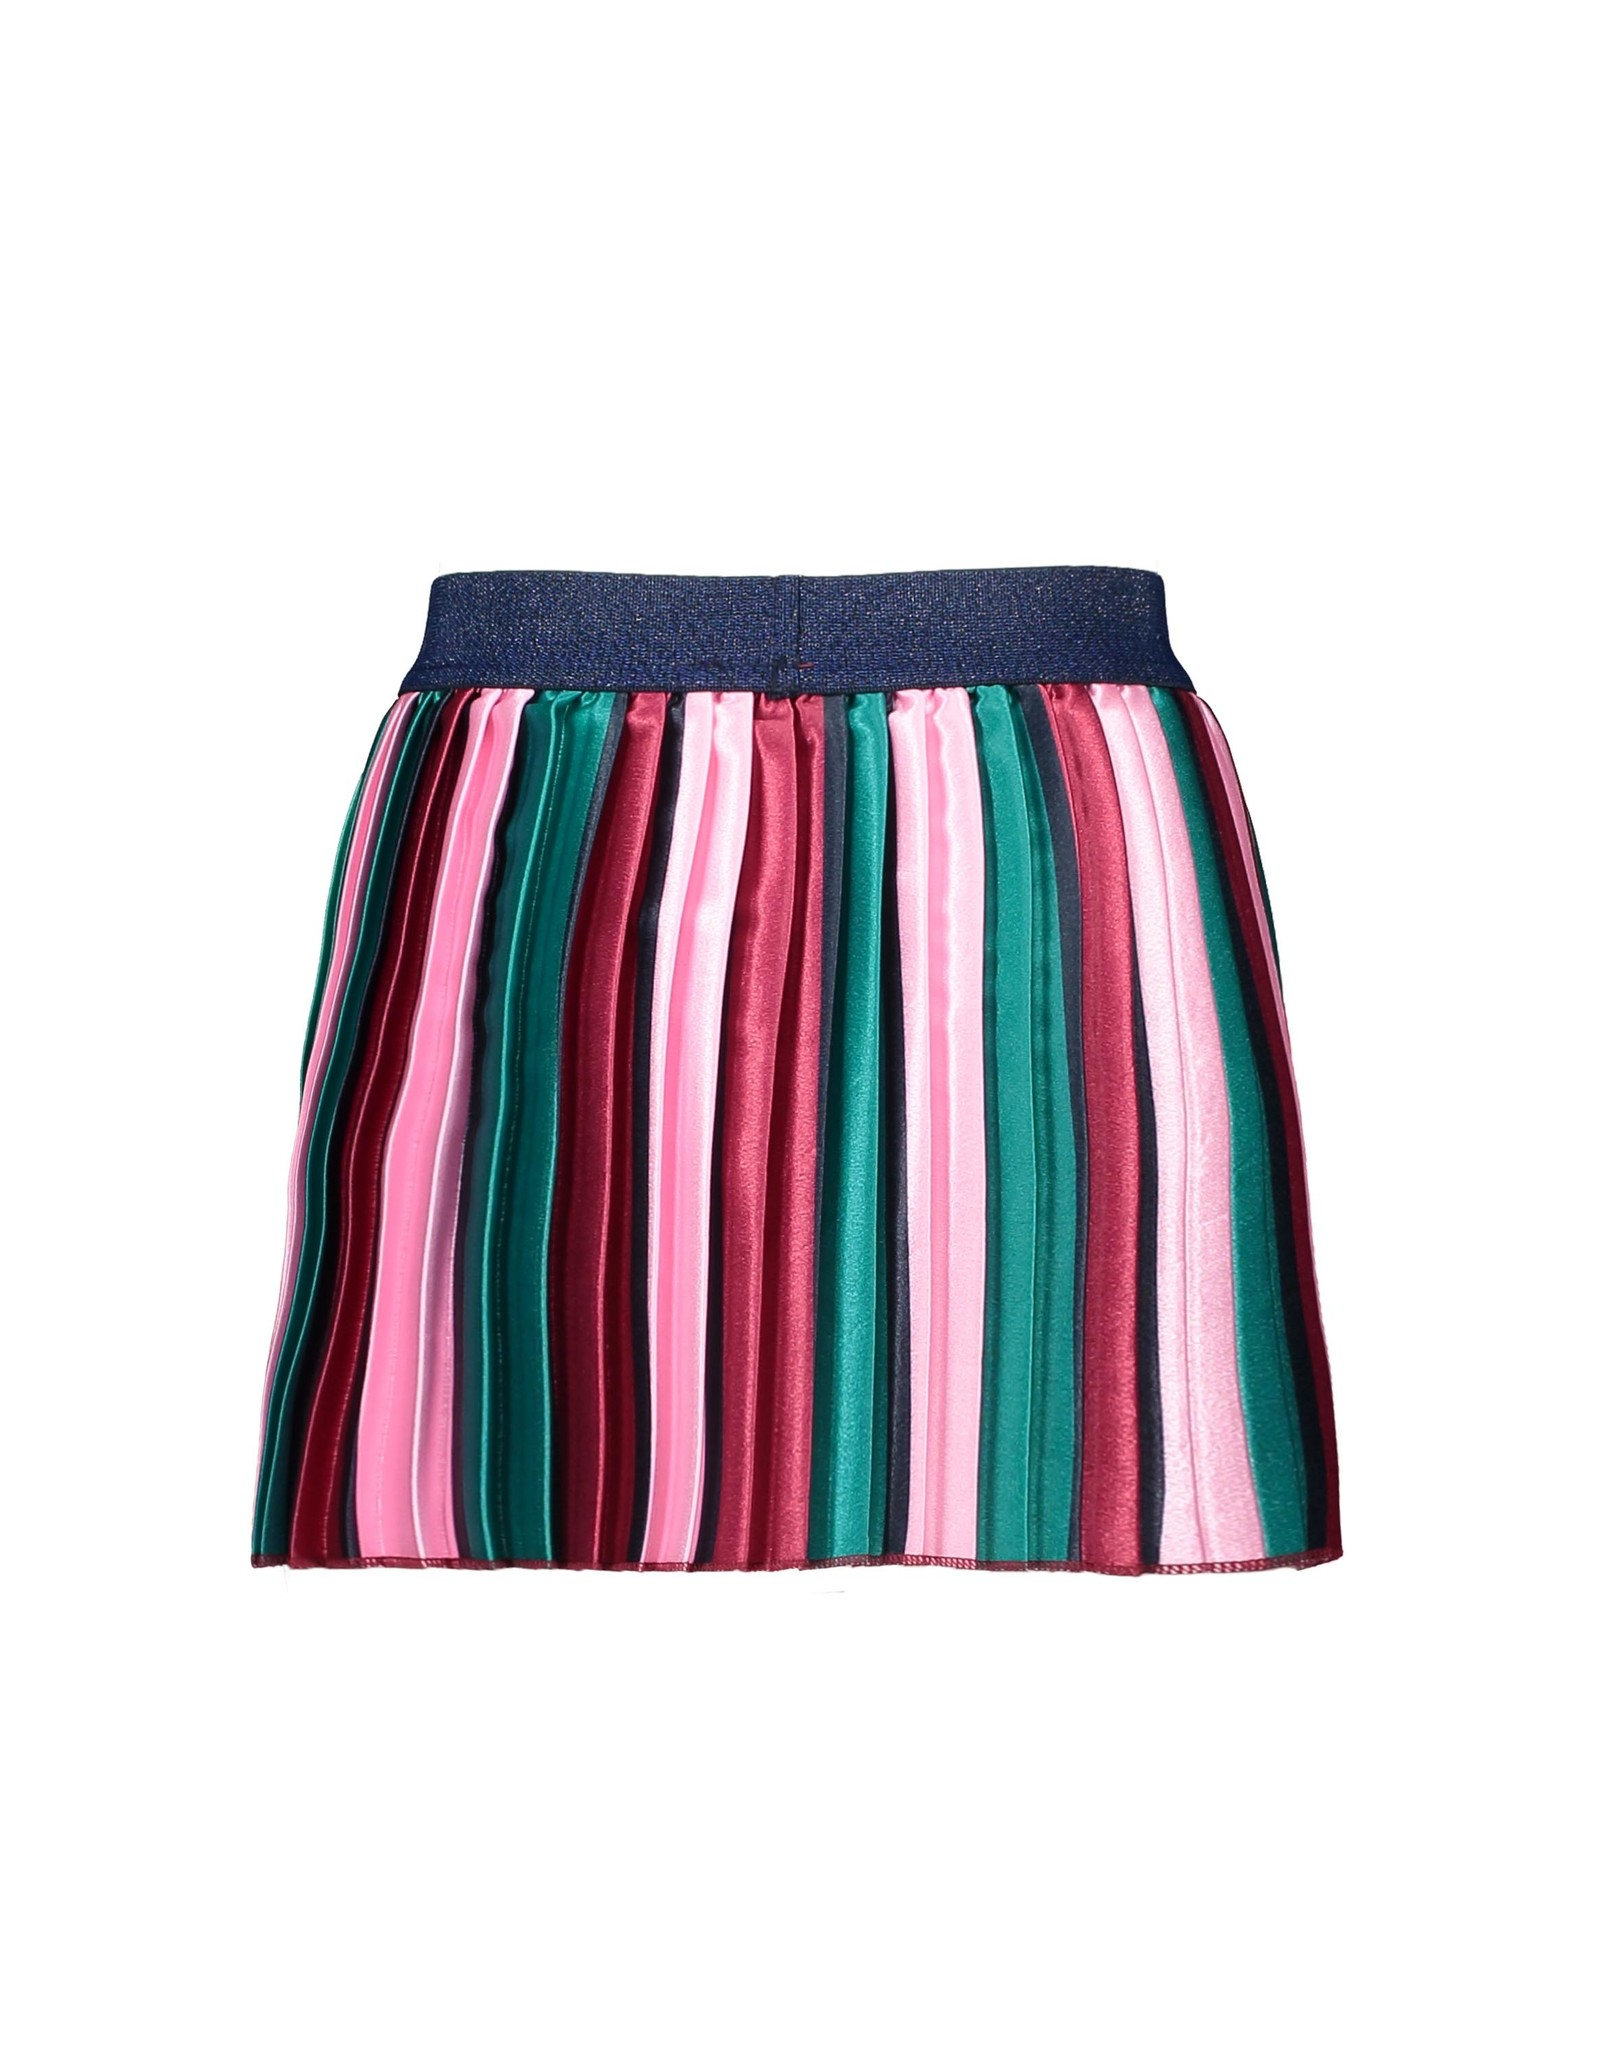 B-Nosy Girls satin pleated skirt with vertical stripes, Fancy stripe